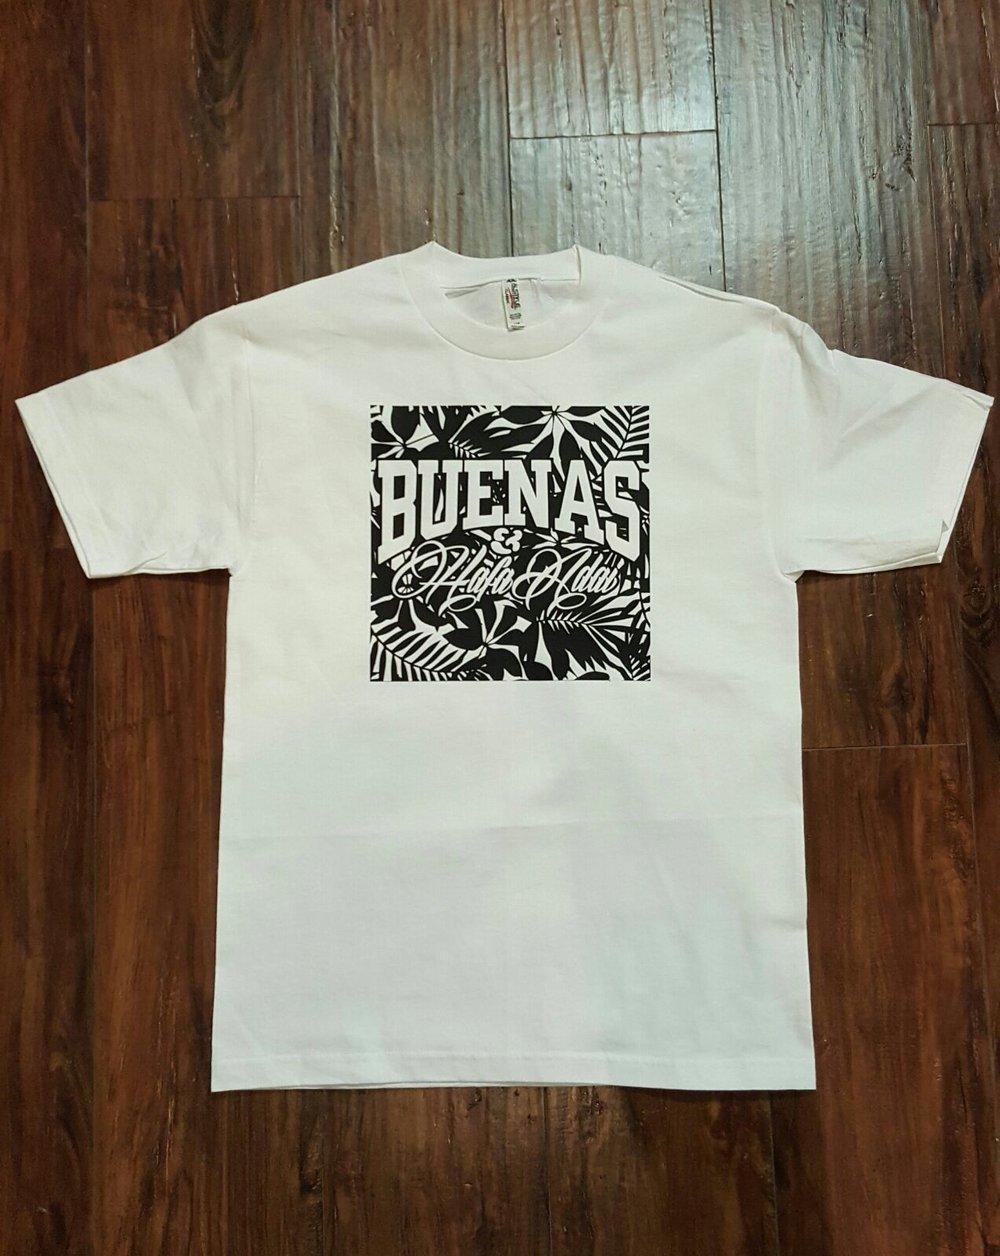 Image of Buenas & Hafa Adai Tropical